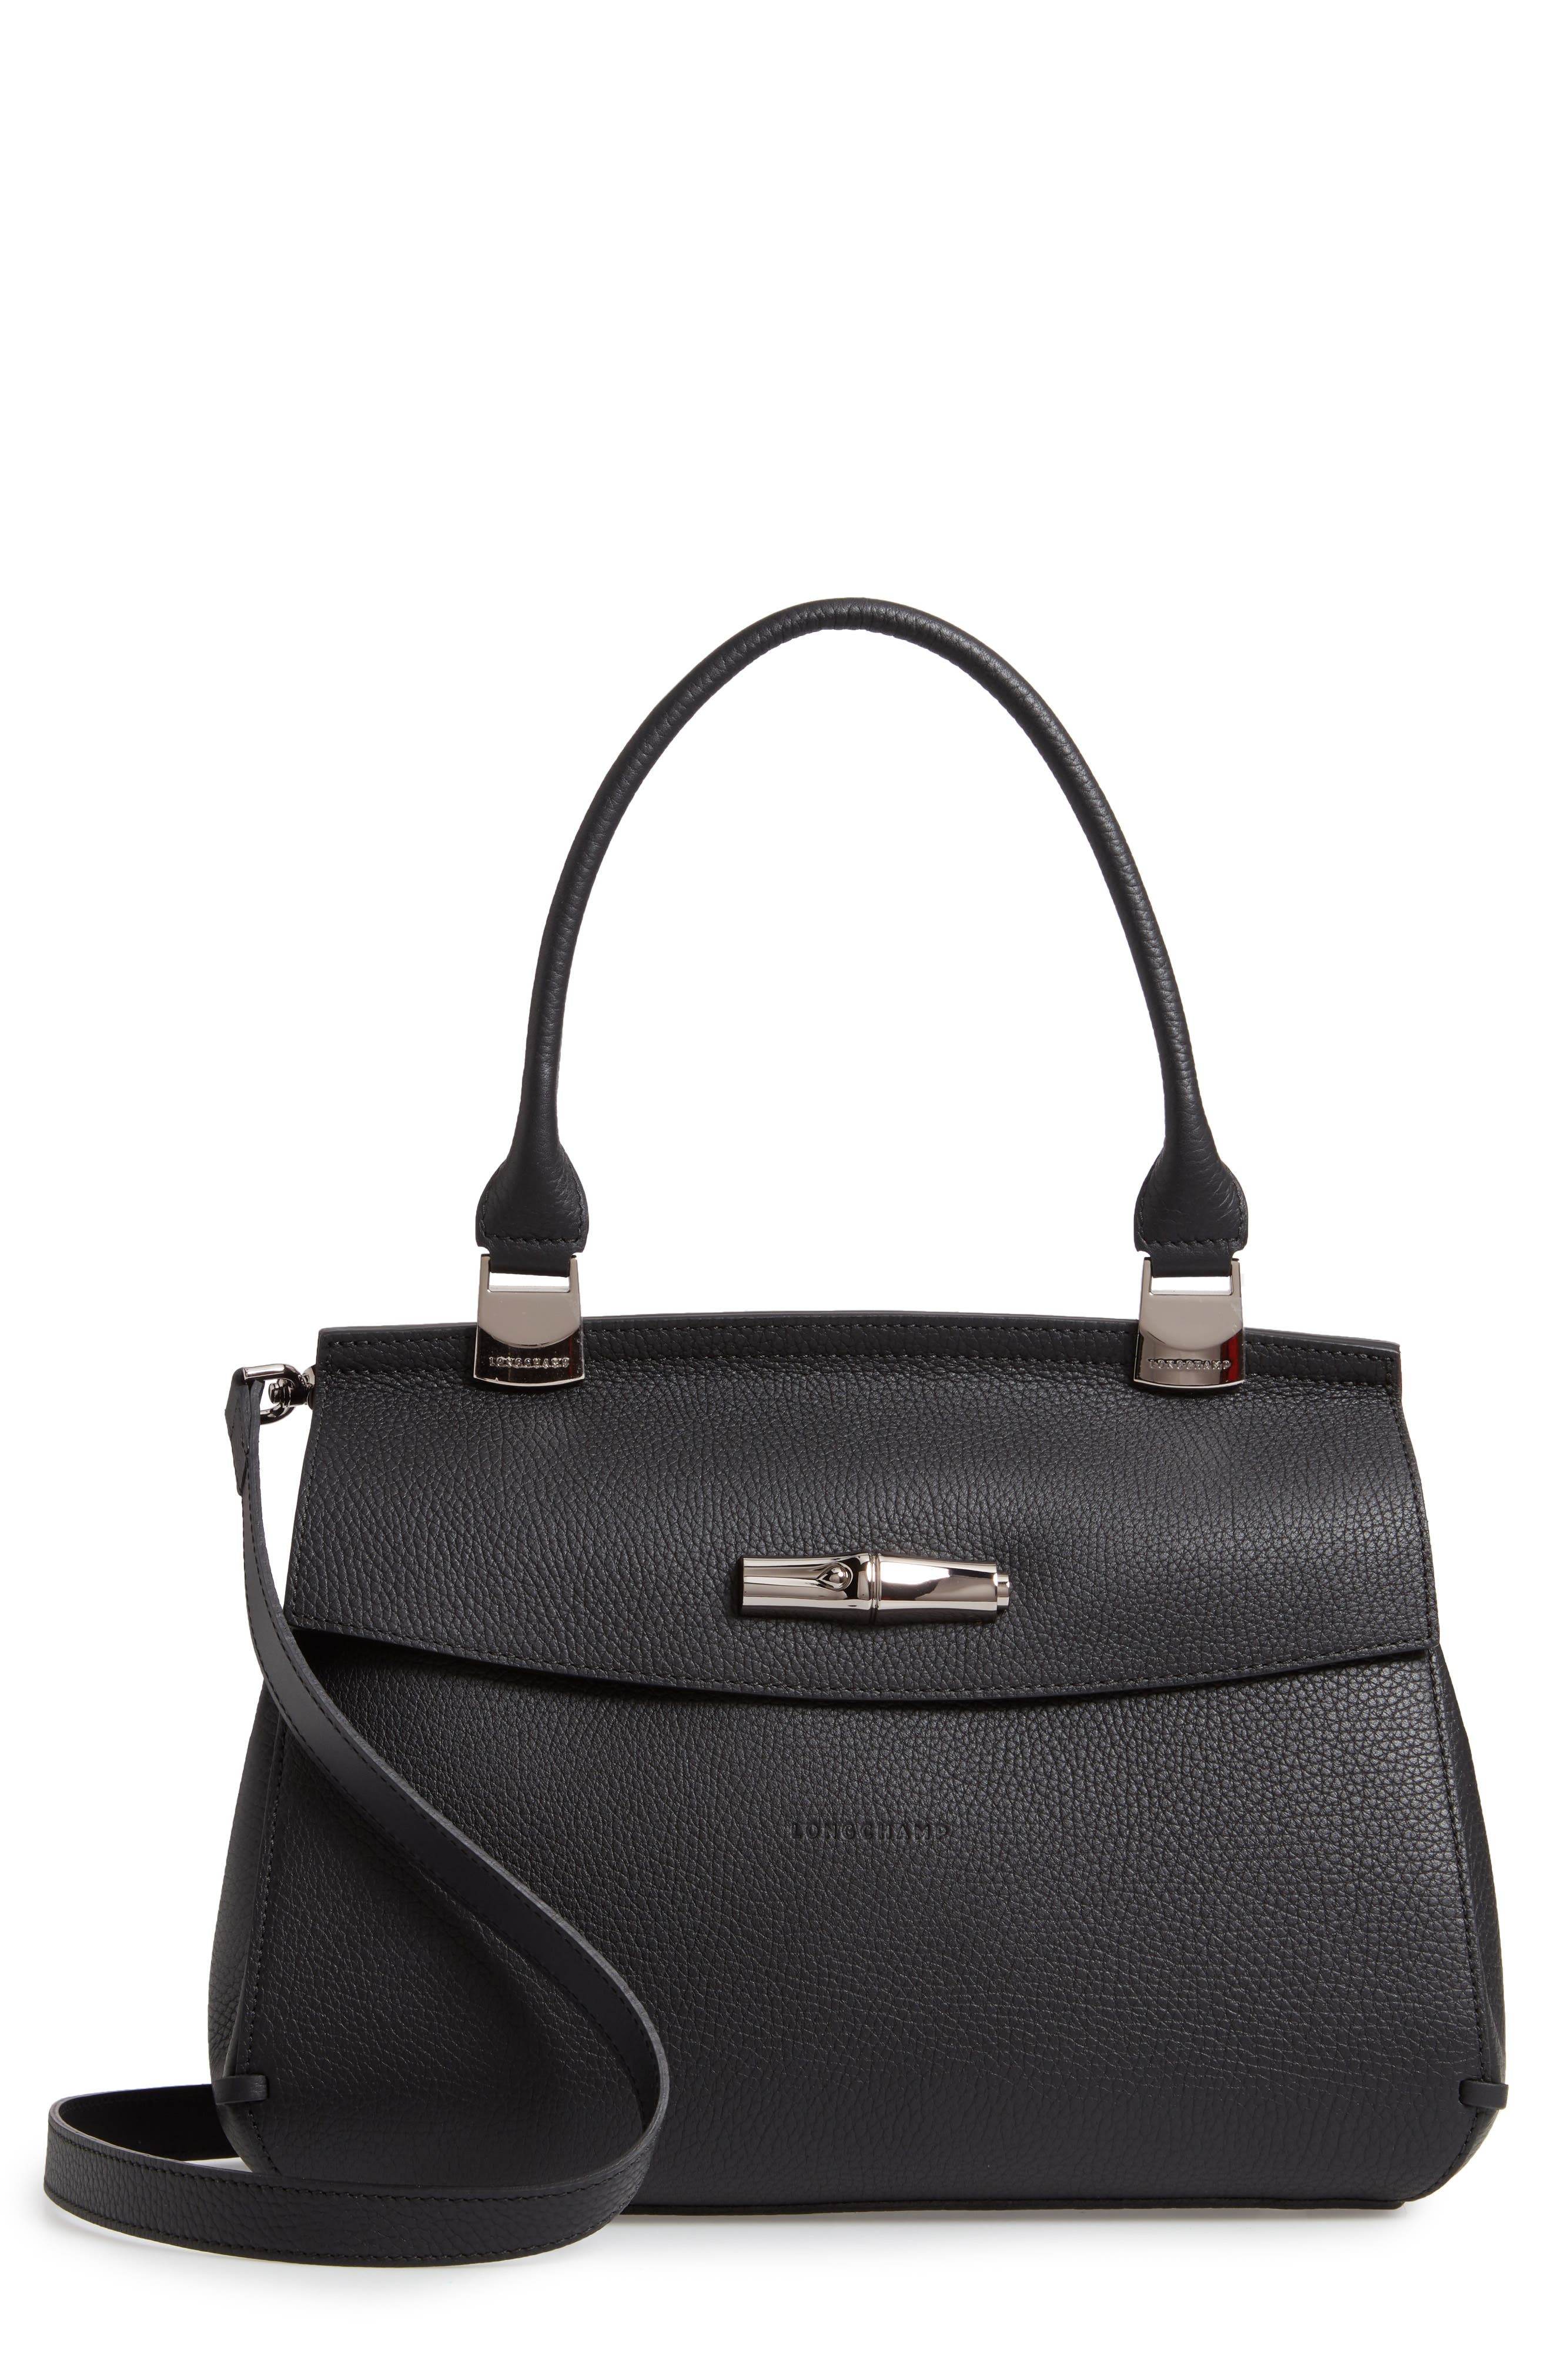 LONGCHAMP Madeleine Leather Satchel, Main, color, BLACK